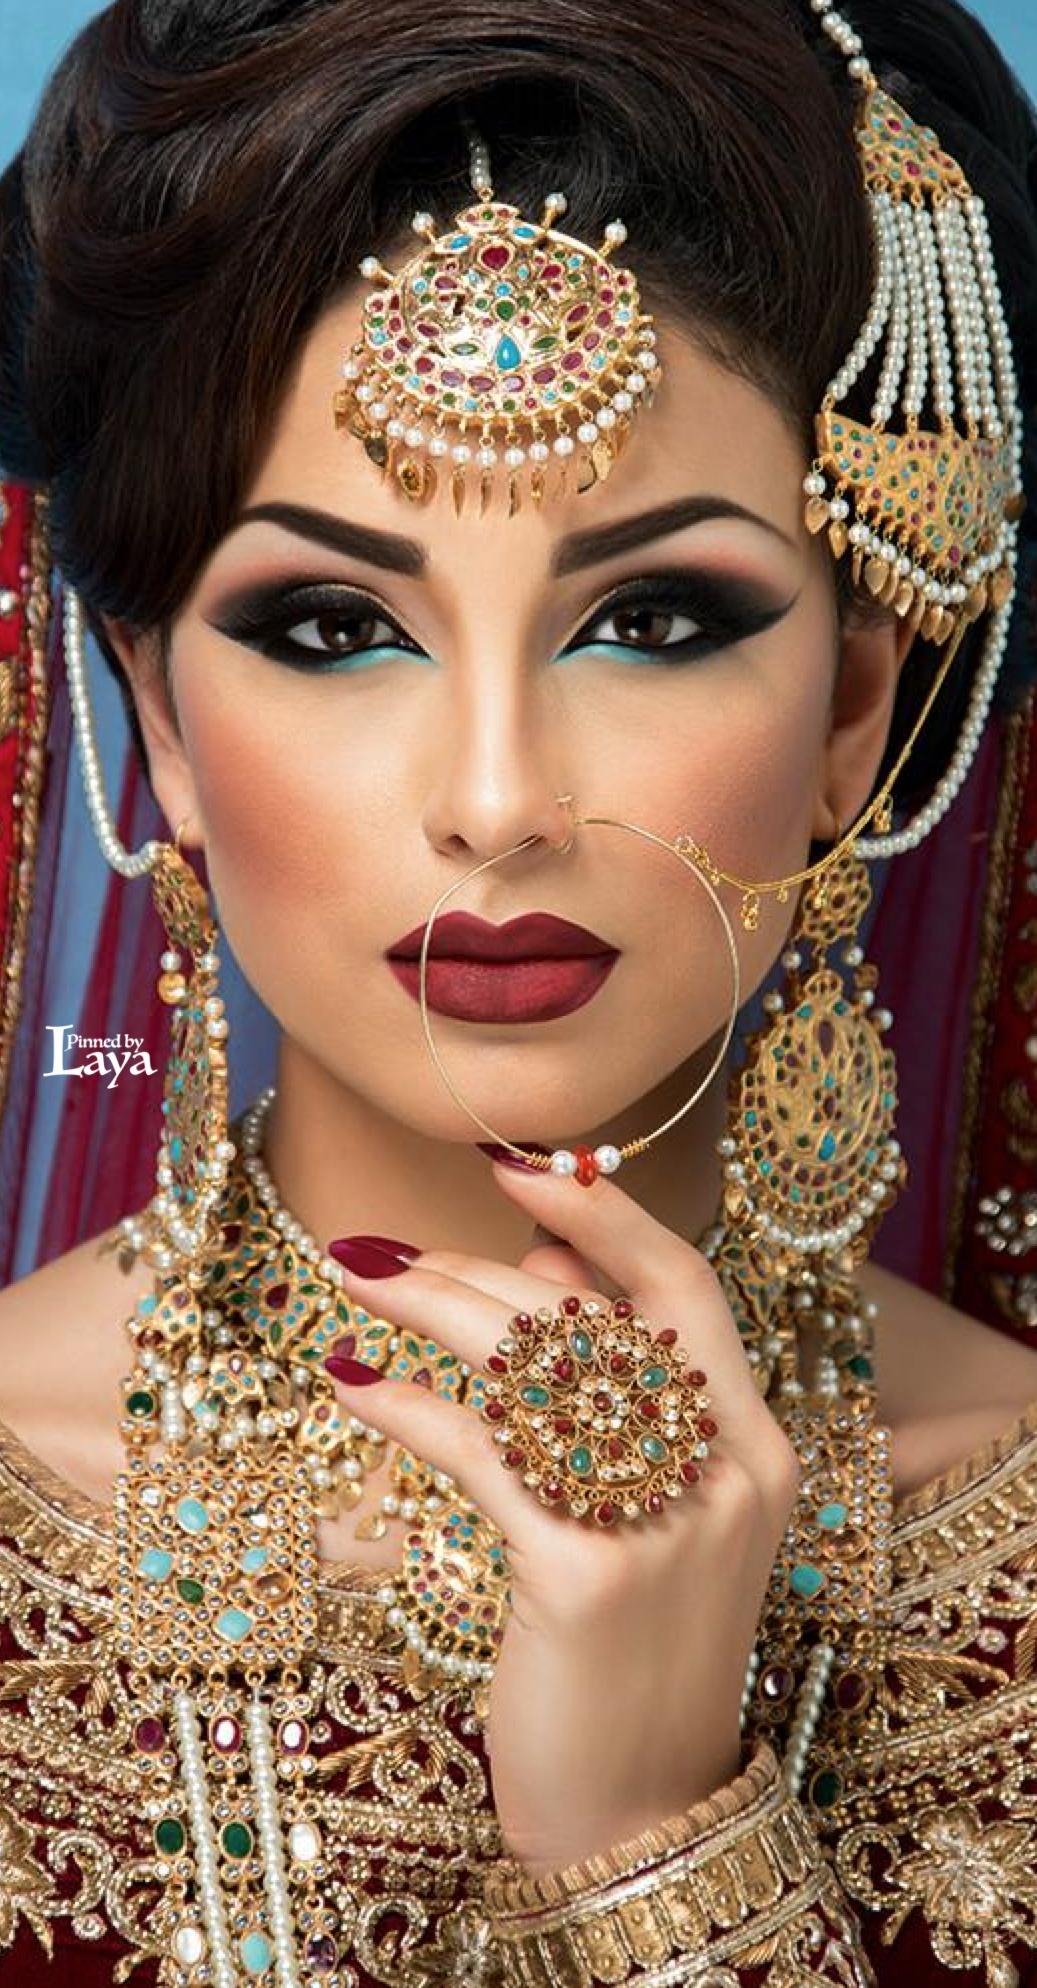 Pin By Label Shrena Hirawat On Beauty, Hair, Makeup | Indian Bridal throughout Bridal Makeup Images Indian